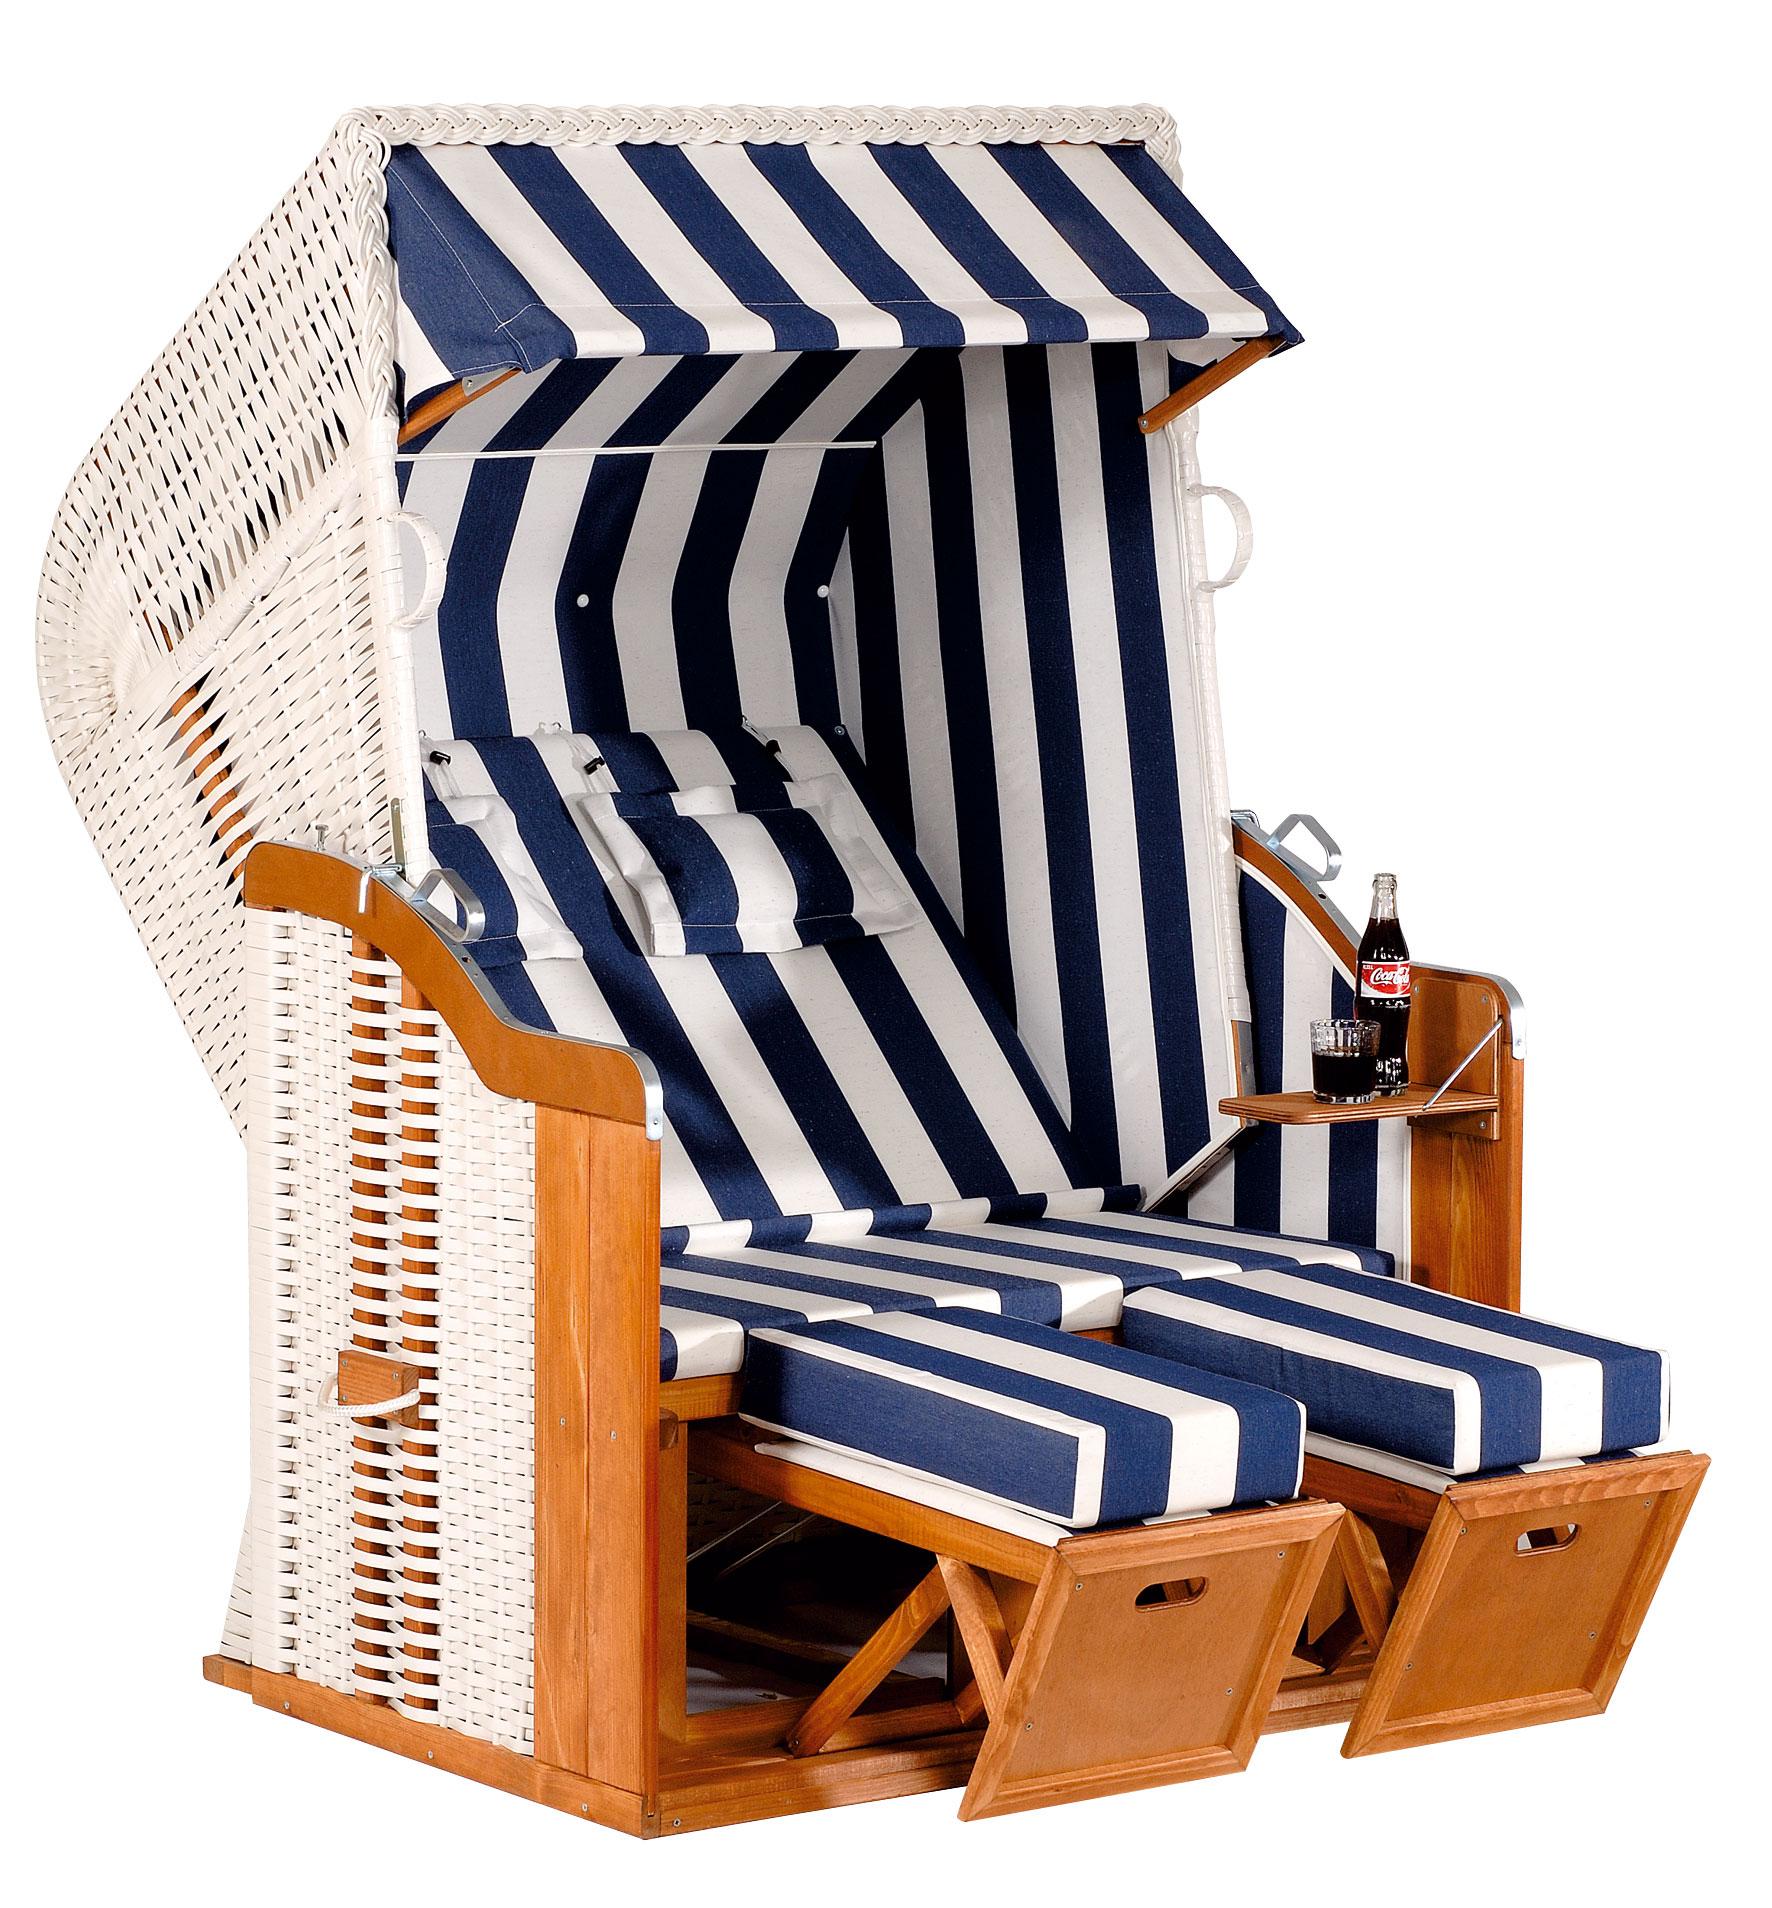 Sunny Smart Strandkorb Halblieger Rustikal 250 Plus Geflecht weiß 80 Bild 1